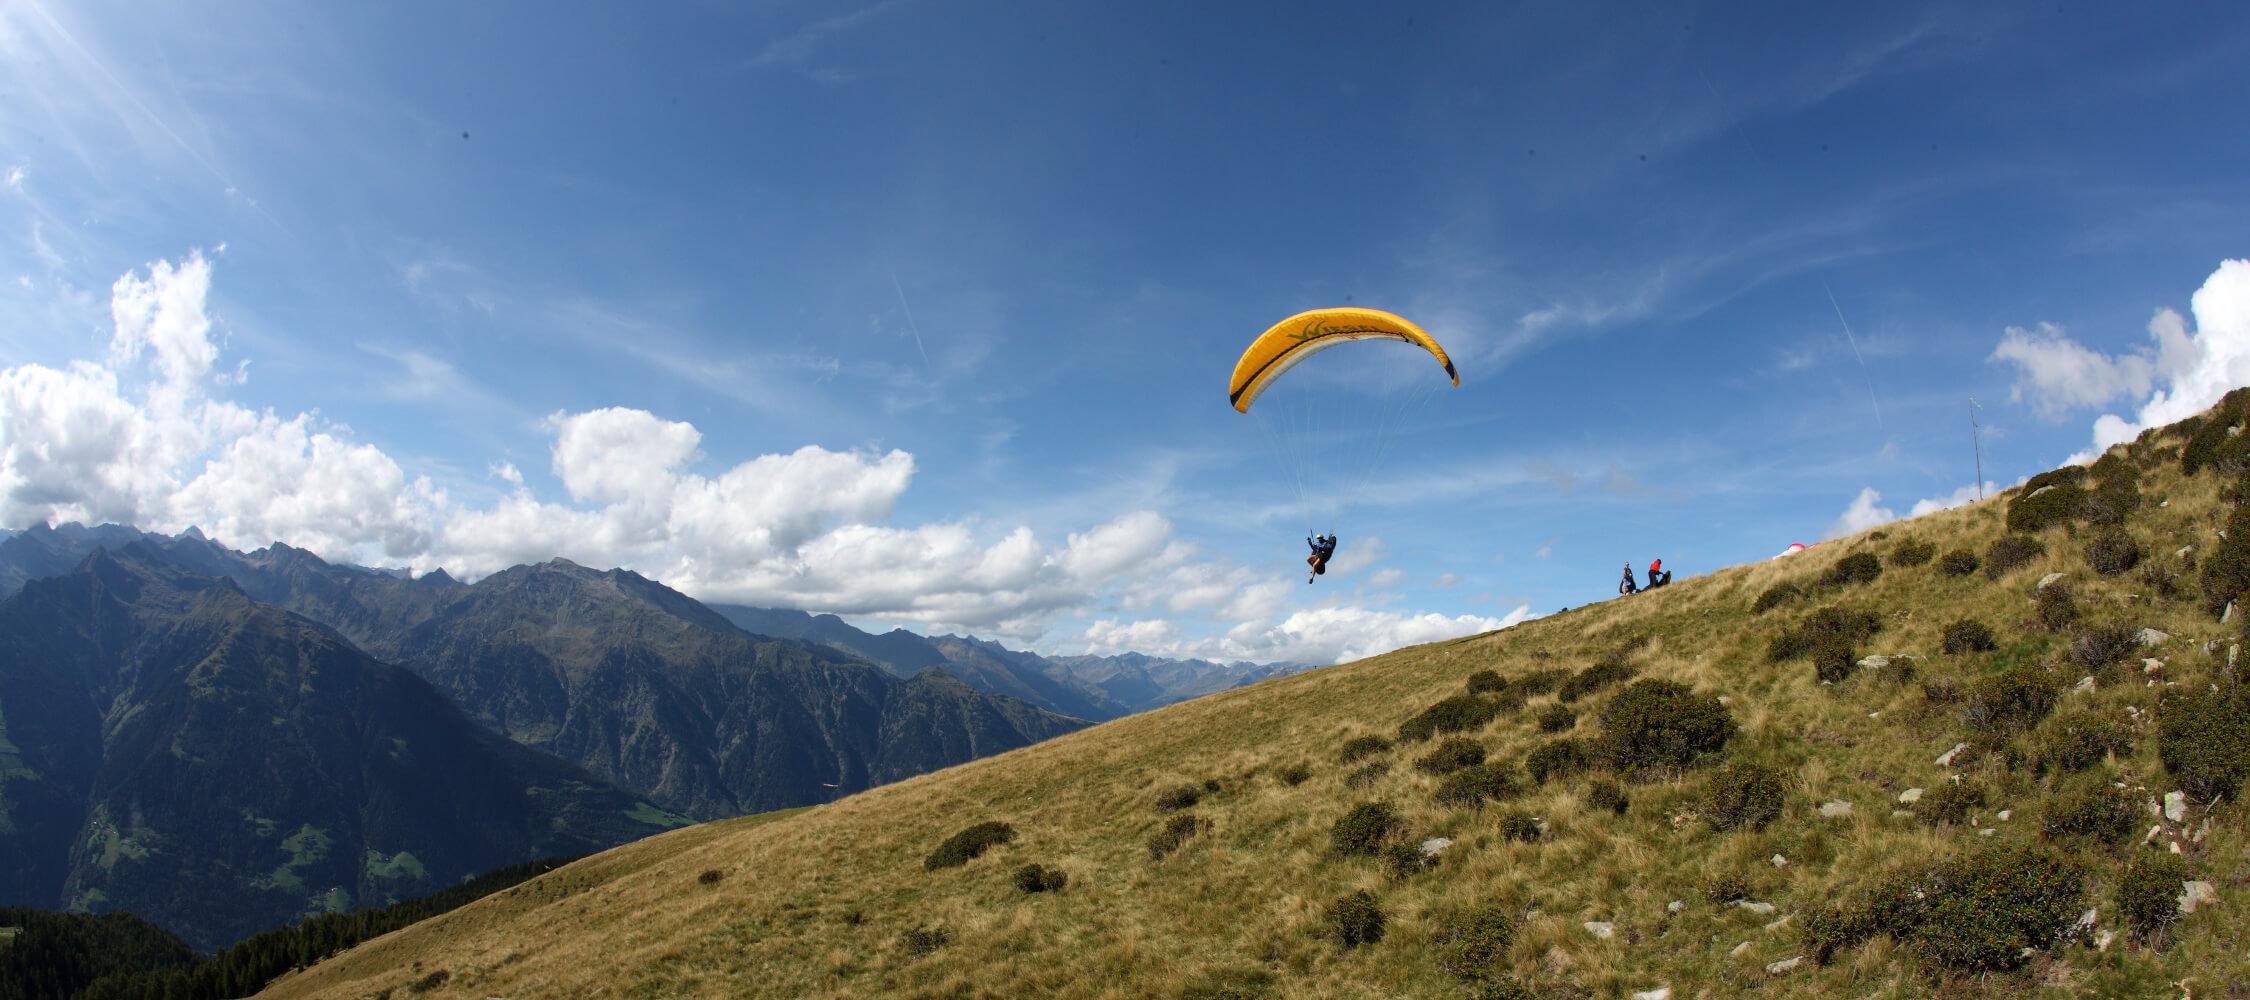 Italien-Trentino_Suedtirol_Alto_Adige_Merano_Meran_Natur_Sport_Paragliden_Fliegen_Tandem_Berge_MGM-Mario- Entero_mgm00279maen_2250x1000